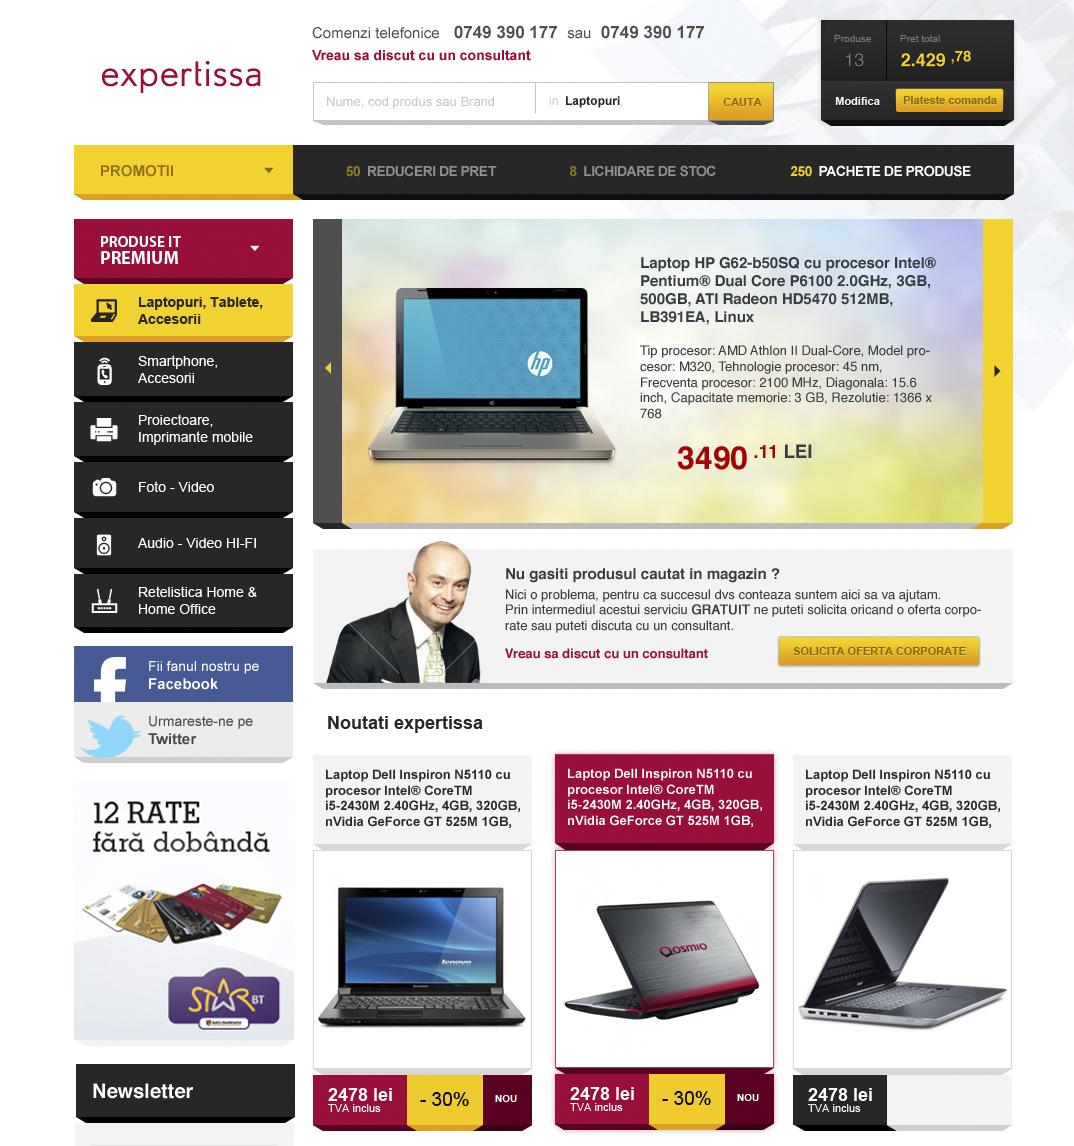 01-expertissa-homepage_large